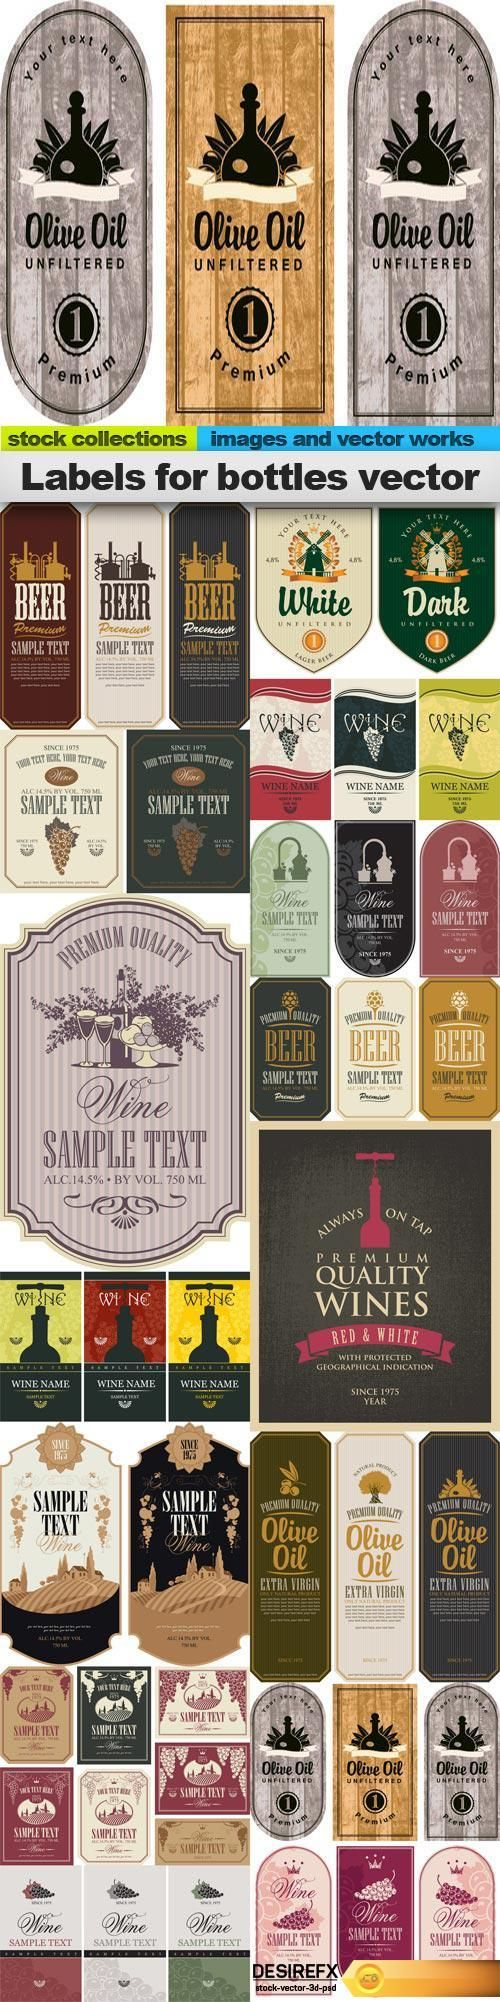 Labels for bottles vector, 15 x EPS http://www.desirefx.me/labels-for-bottles-vector-15-x-eps/